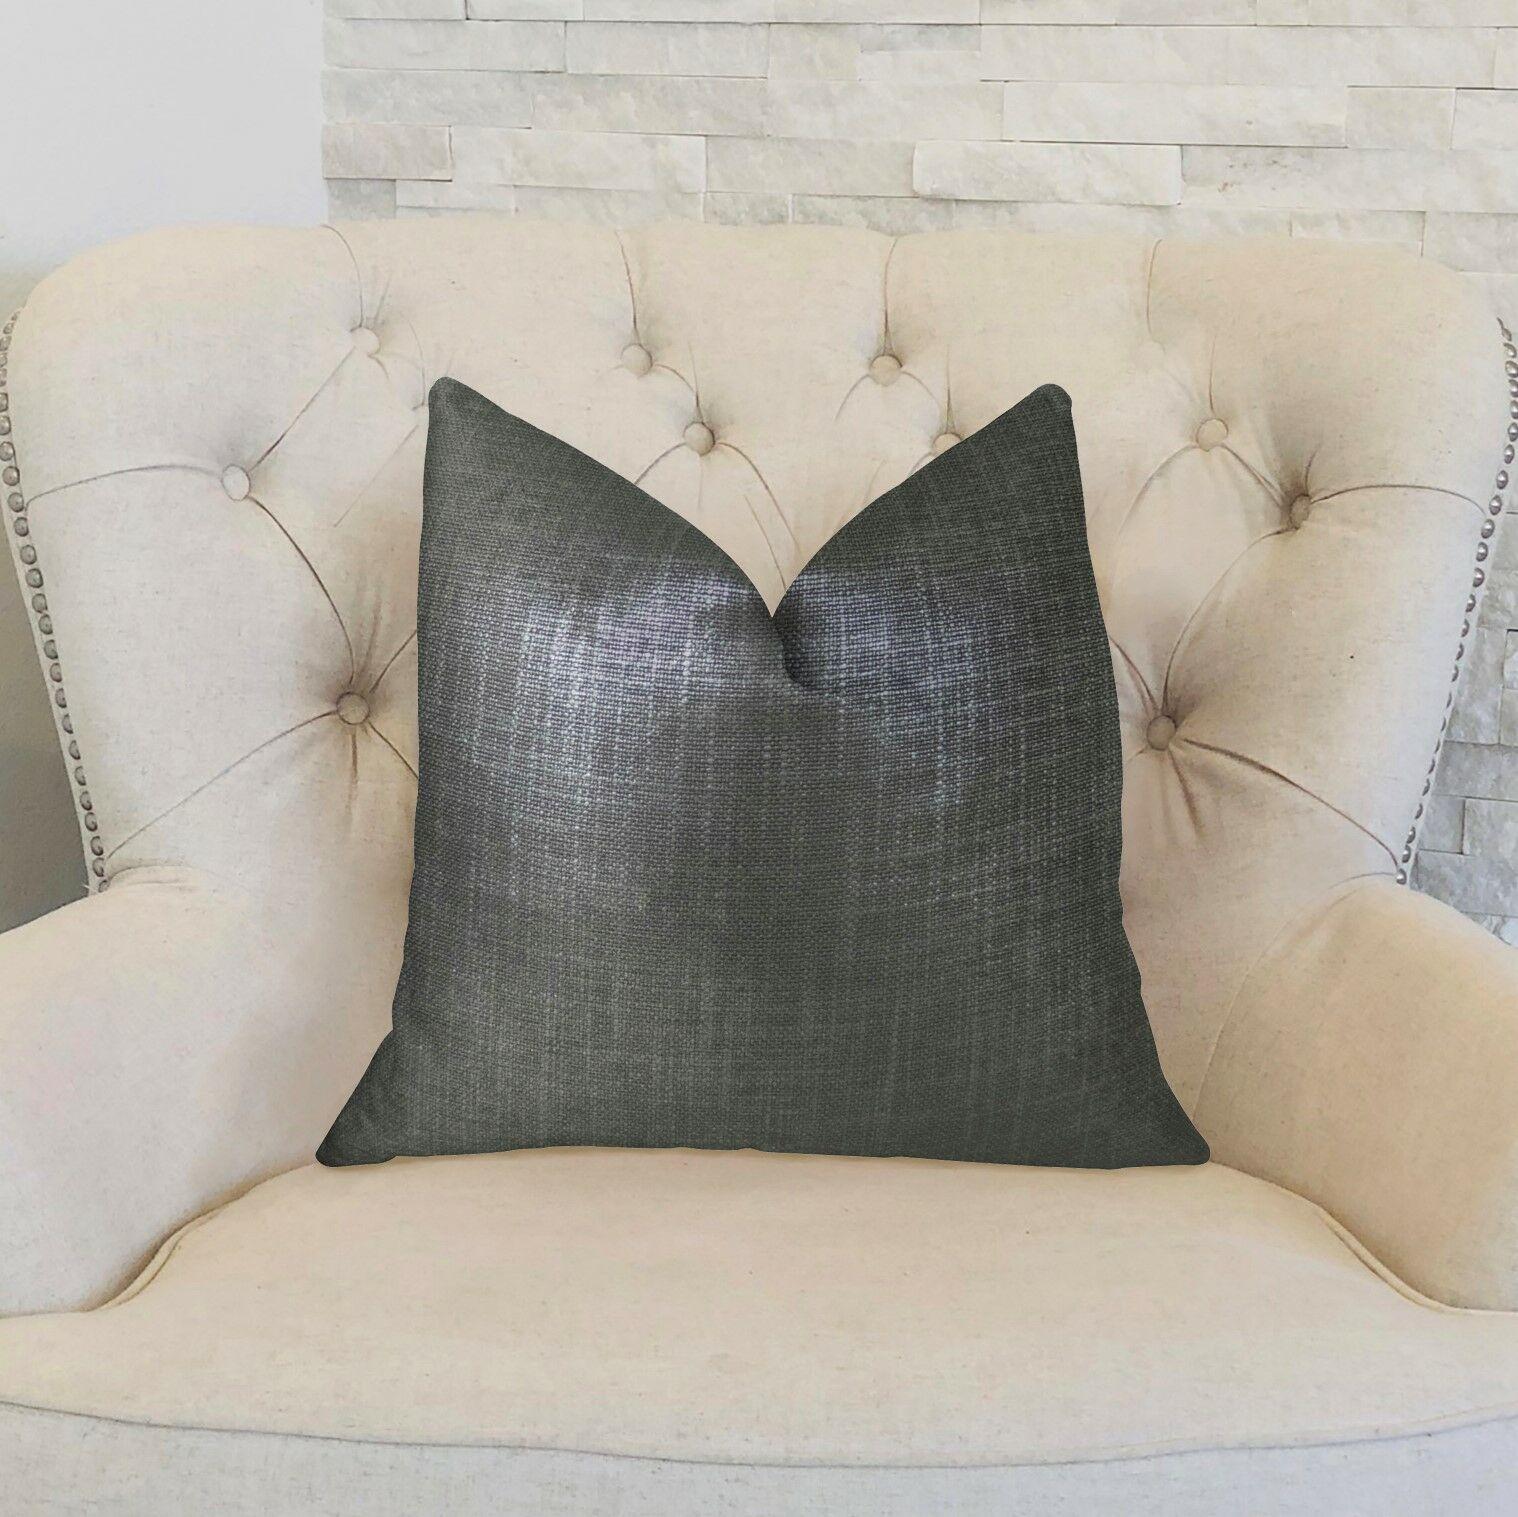 Gantz Handmade Luxury Pillow Size: 20